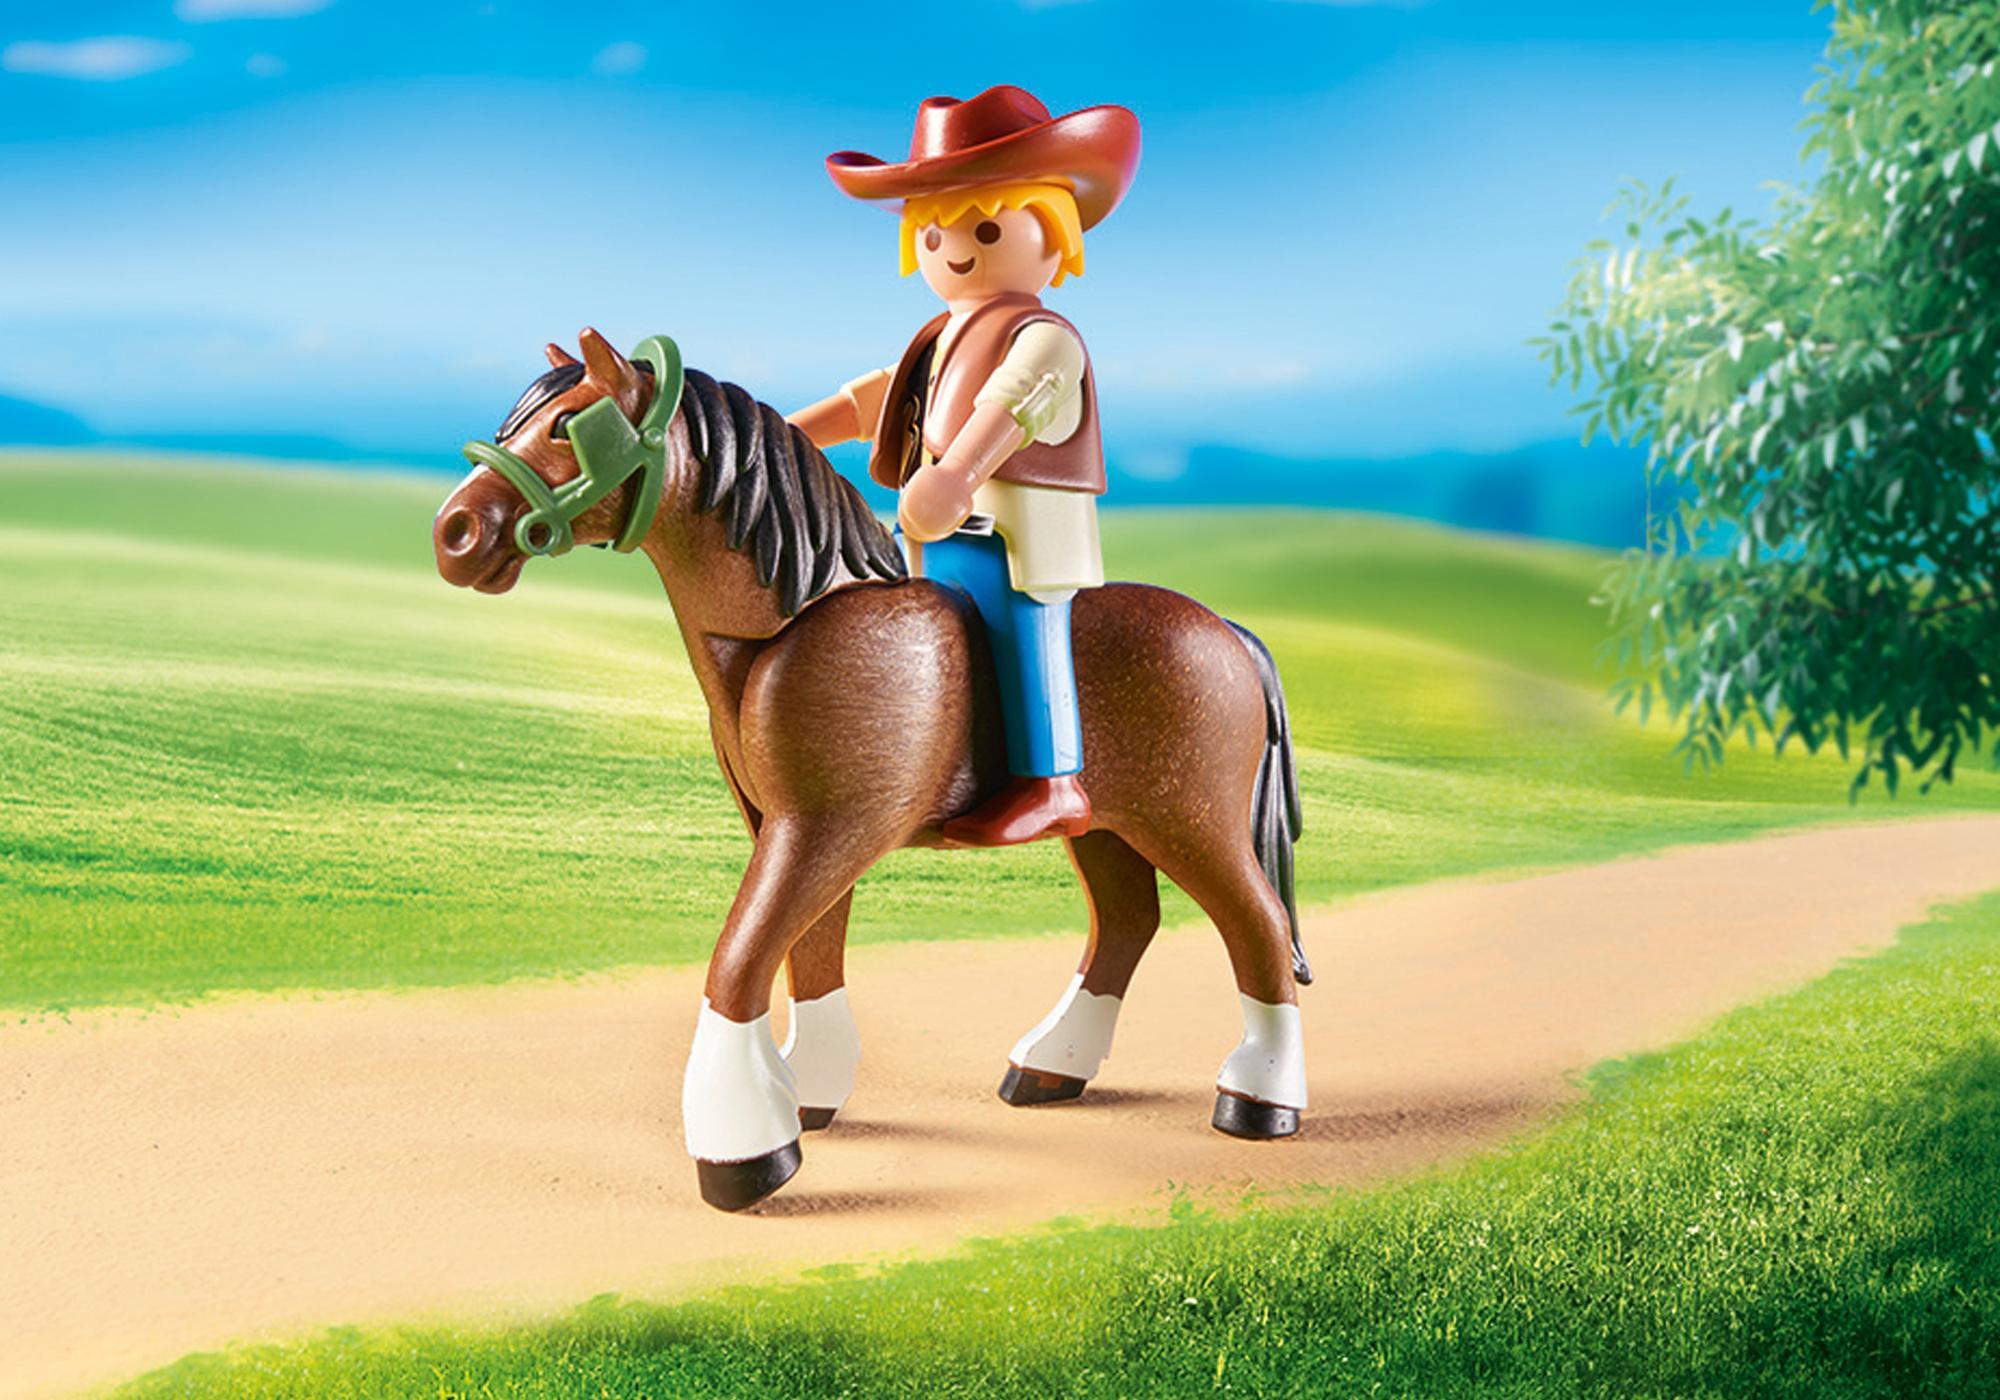 http://media.playmobil.com/i/playmobil/6932_product_extra2/Horse-Drawn Wagon